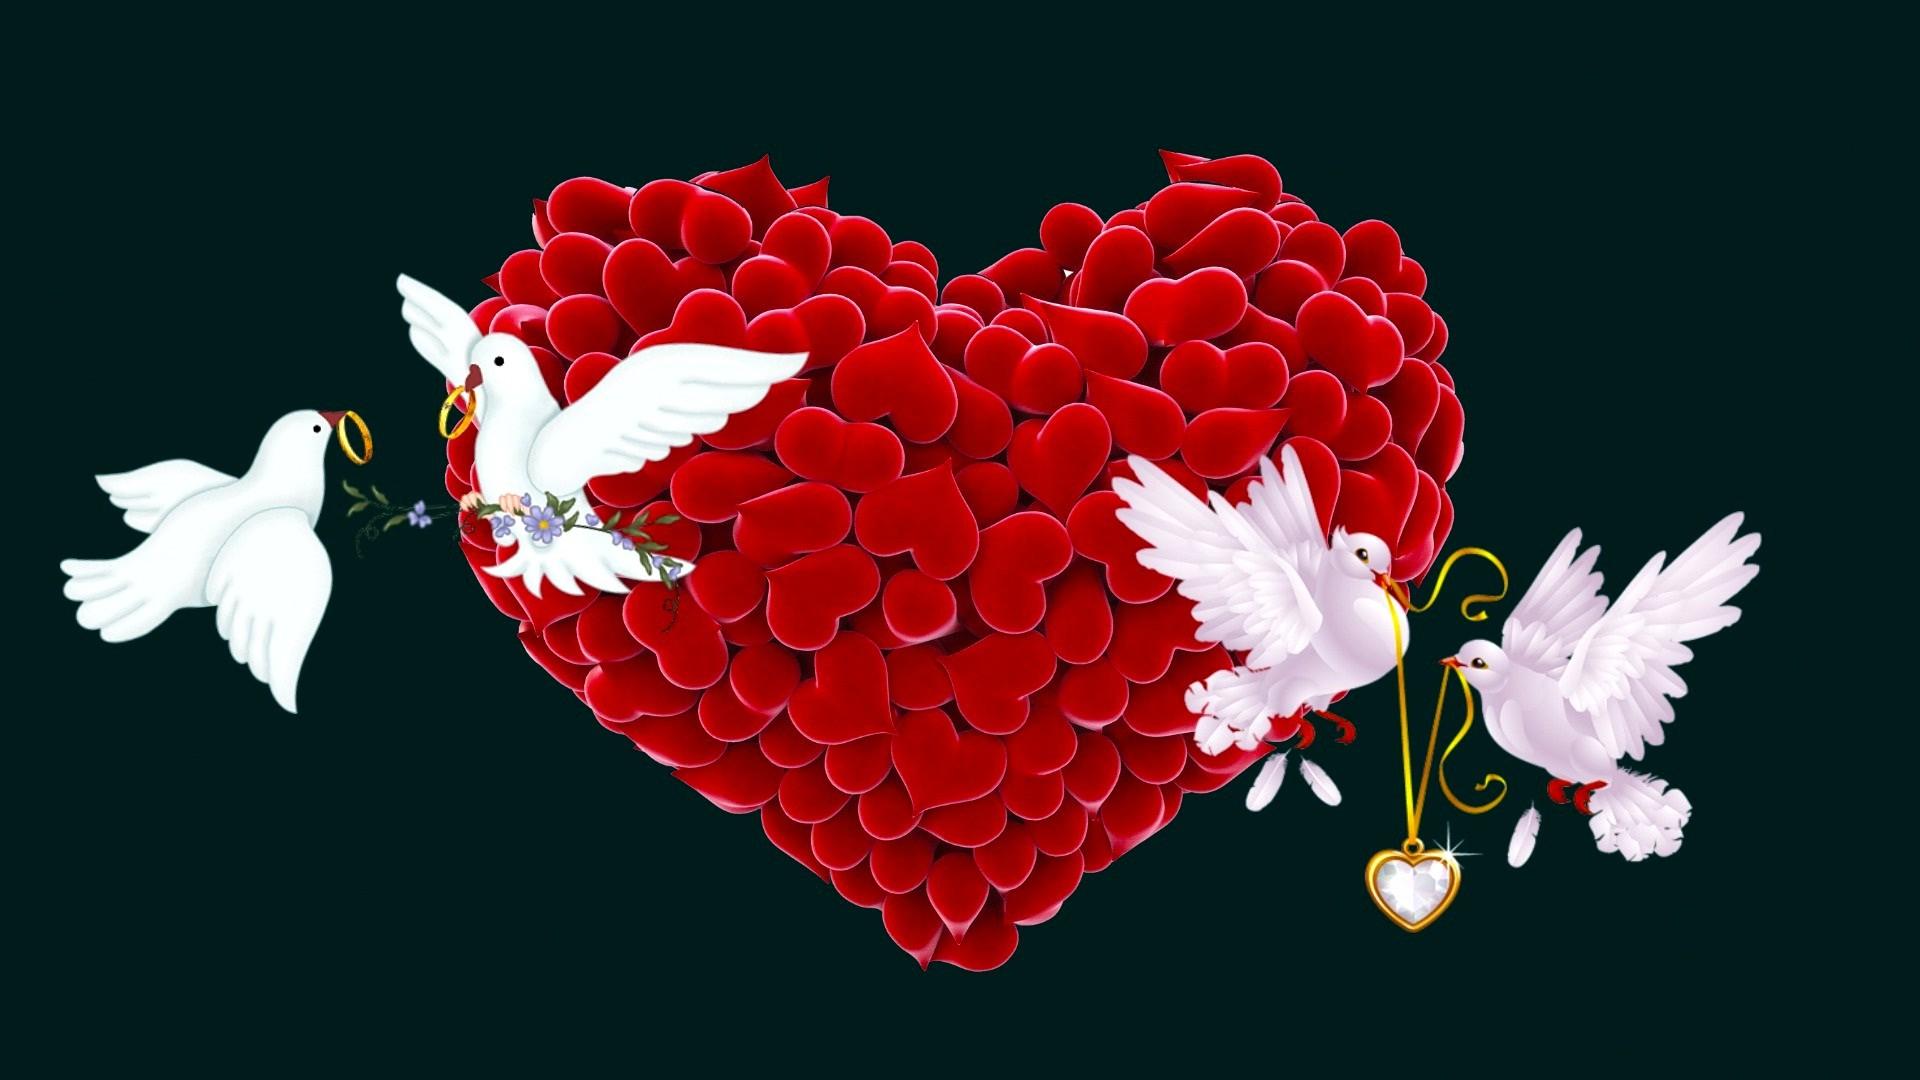 Cute Couples Wallpapers Desktop Lovebirds Wallpapers 183 ①